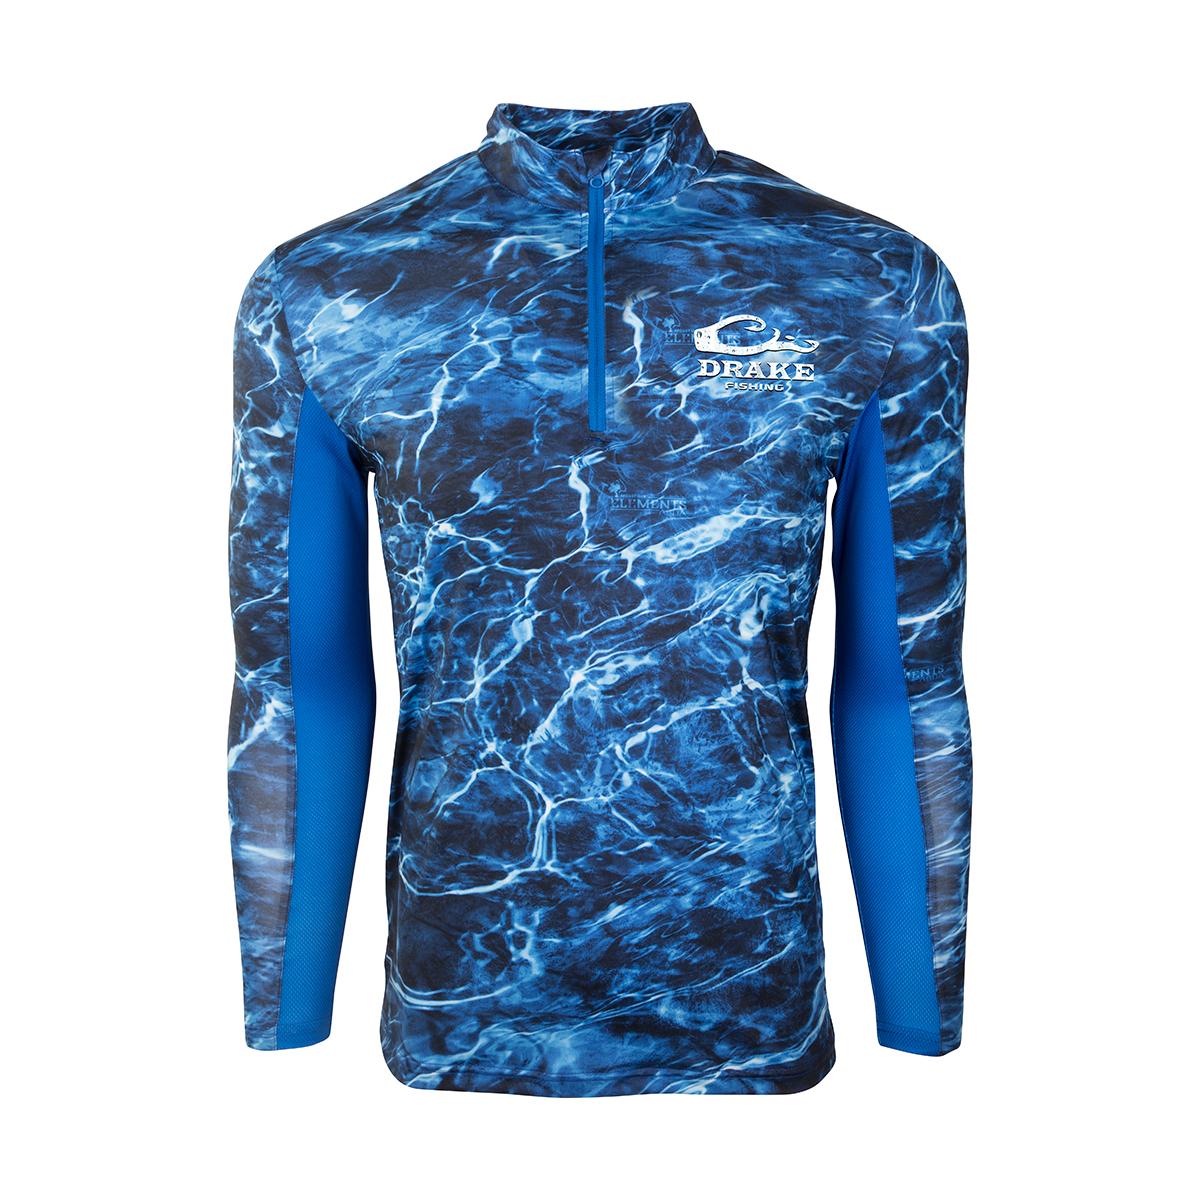 drake-performance-fish-big-tall-mesh-shirt-quarter-bigcamo-elements-marlin